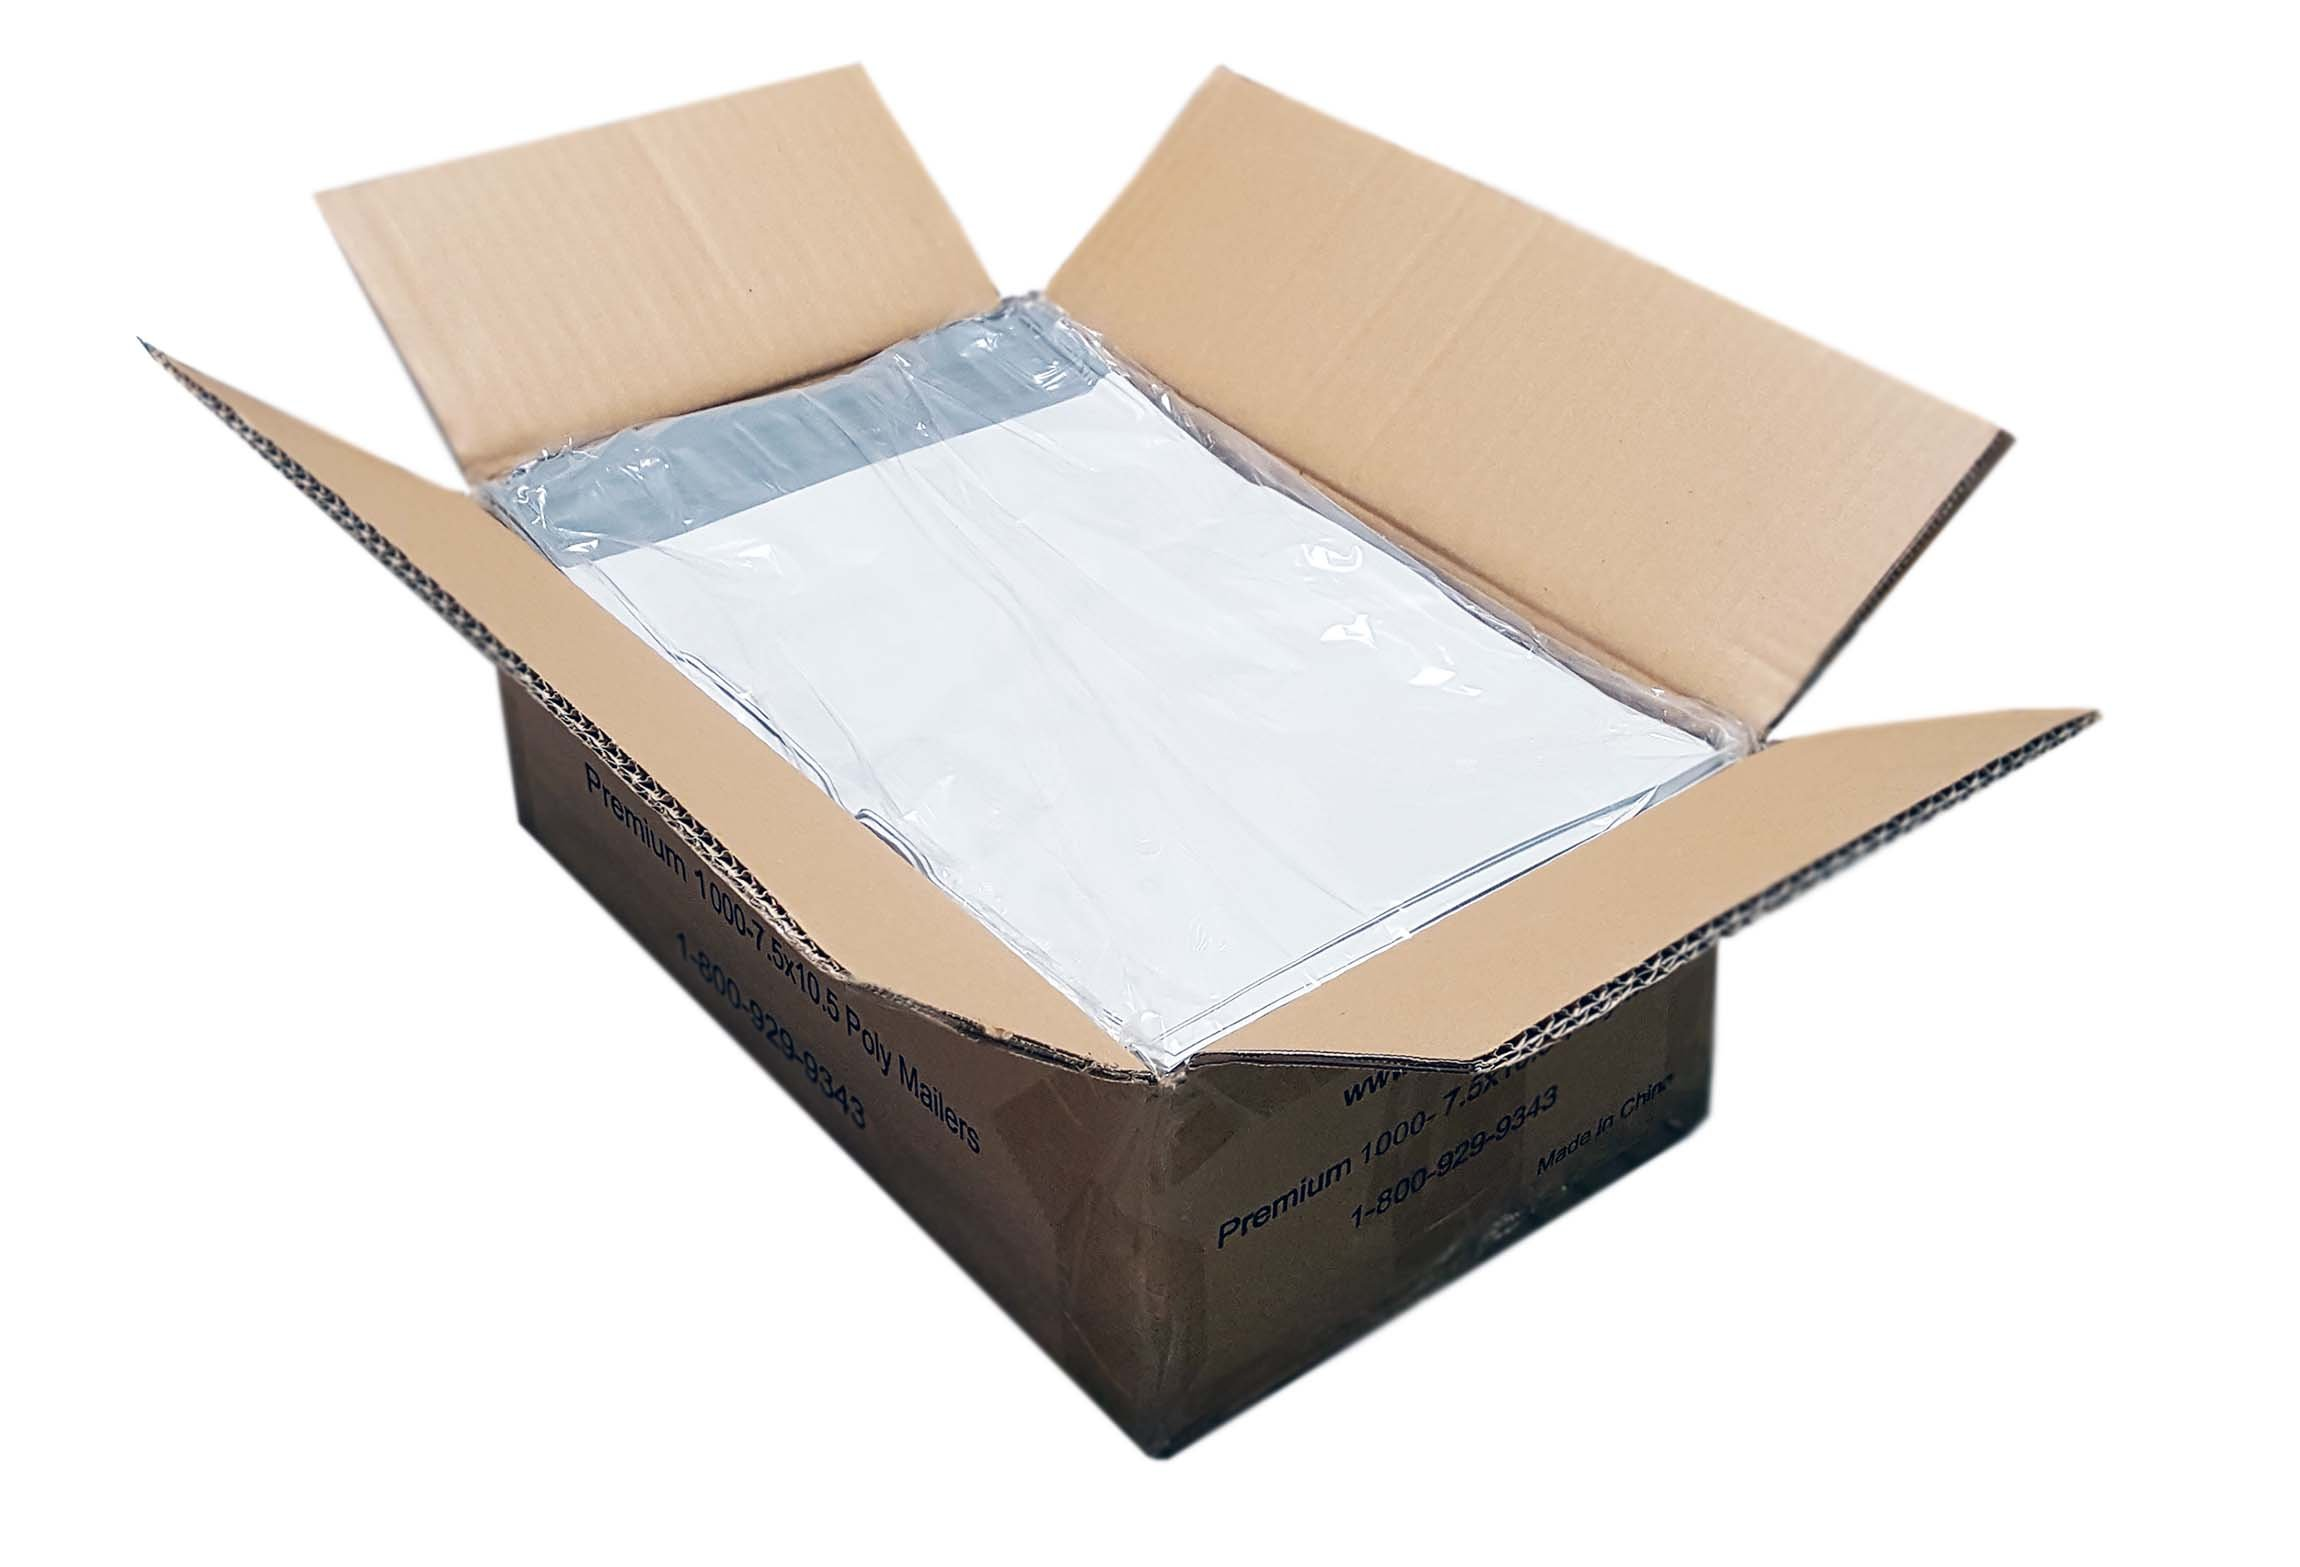 iMBAPrice 1000 - 7.5x10.5 Premium Matte Finish White Poly Mailers Envelopes Bags (iMBA-2PM-1000) by iMBAPrice